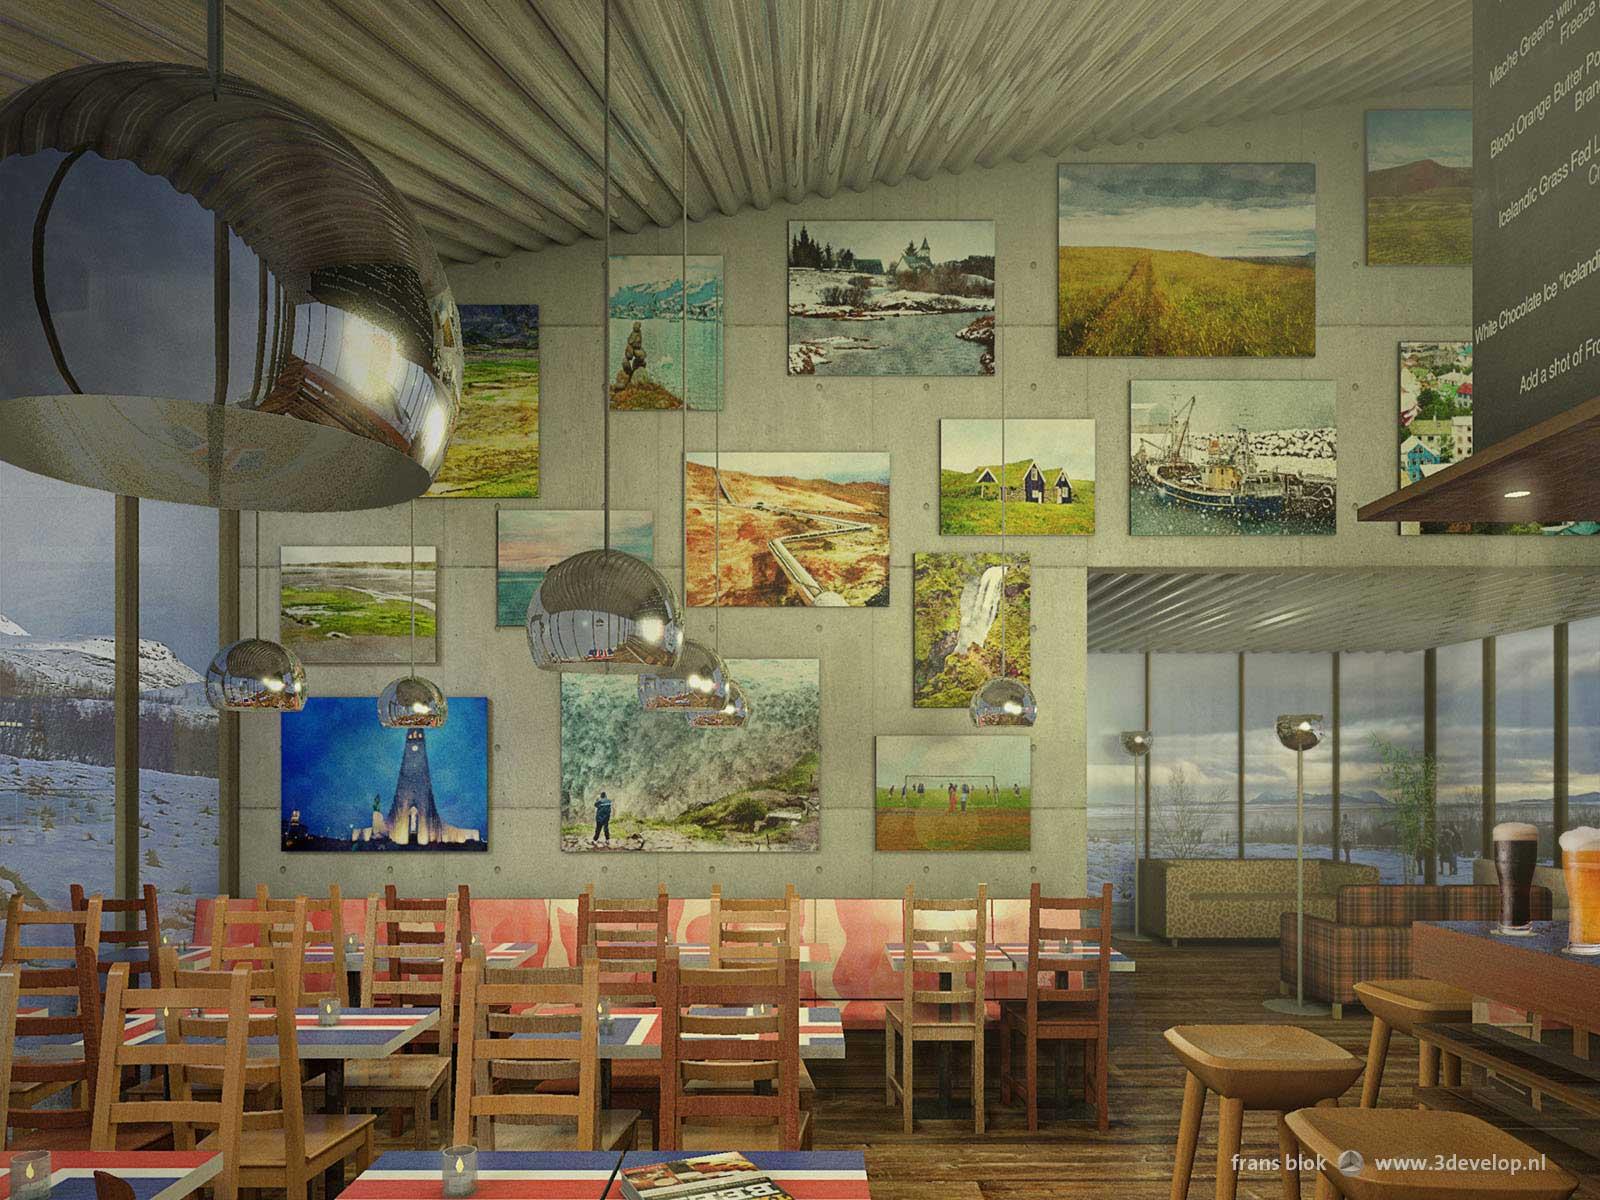 Artist impression of a fictional Icelandic cafe